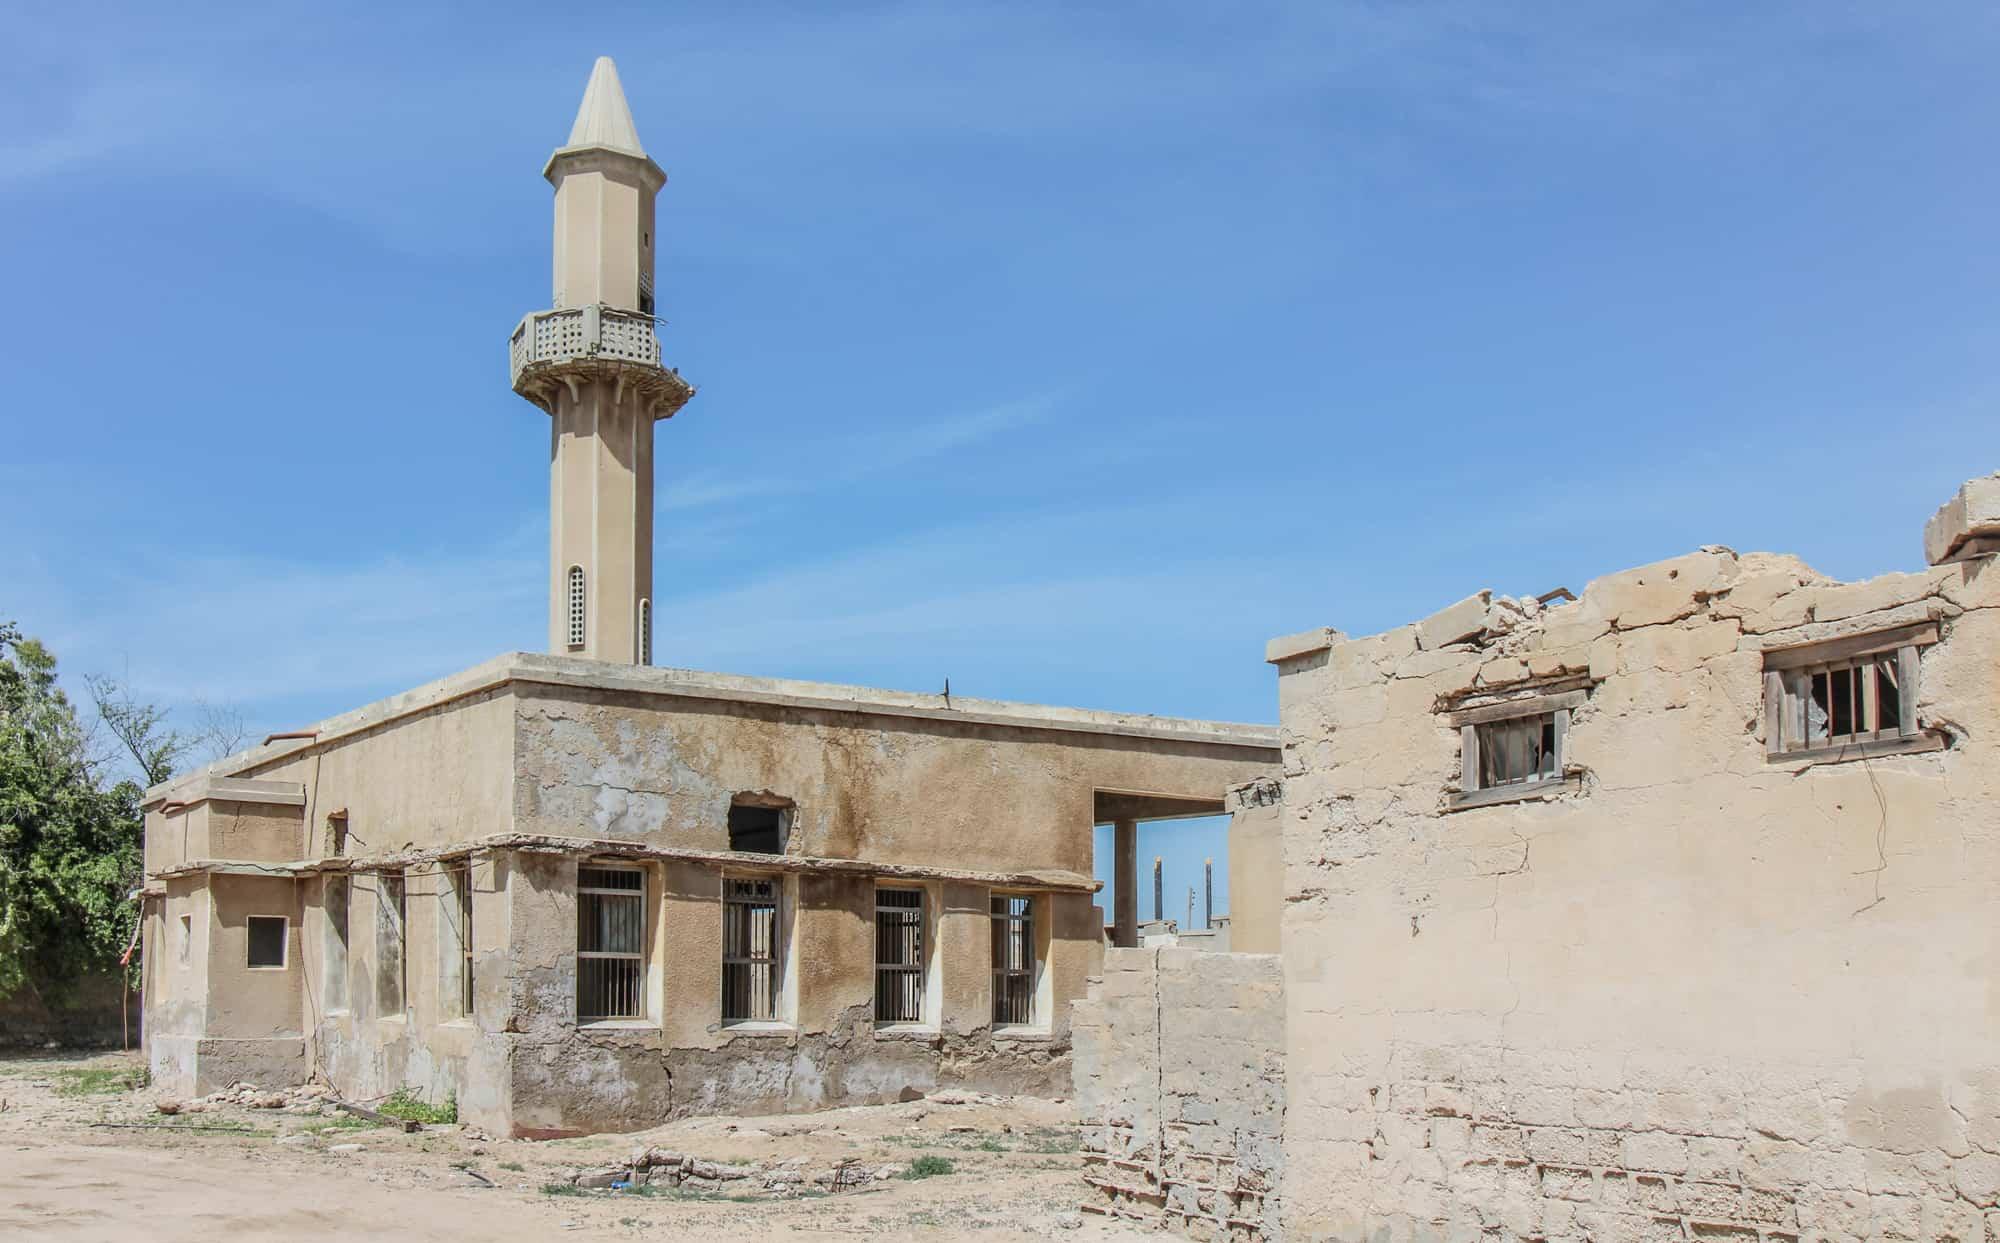 Ras al Khaimah Ghost Town Al Jazirat Al Hambra